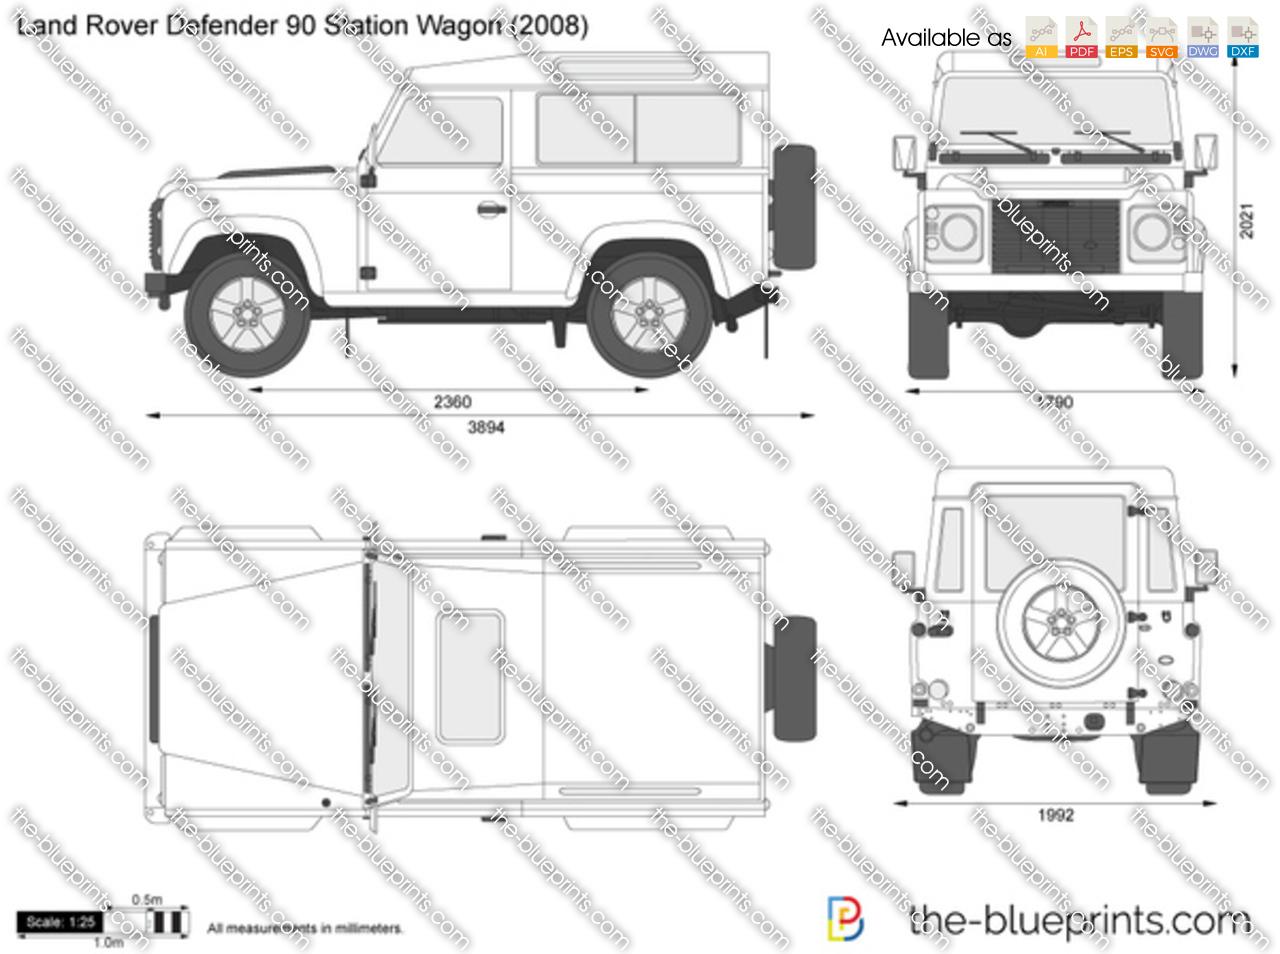 Land Rover Defender 90 Station Wagon Vector Drawing